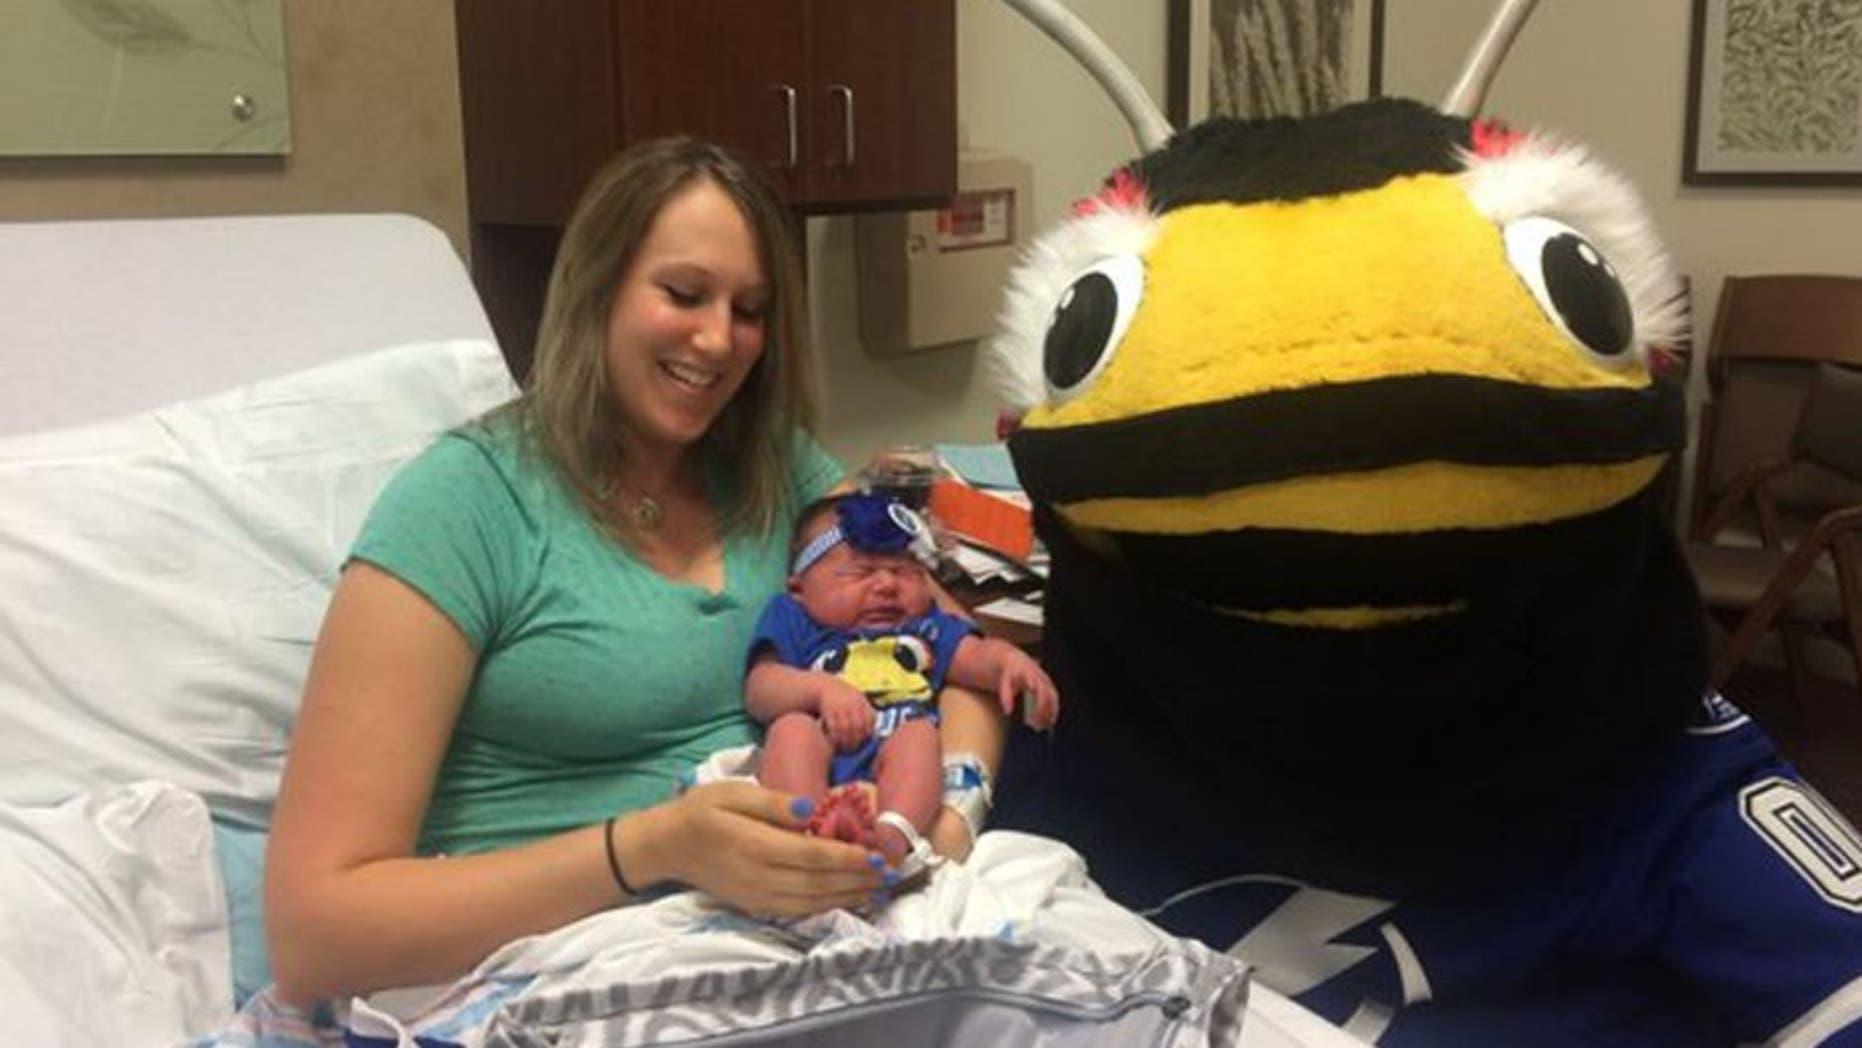 A Tampa Bay couple named their daughter after Lightning forward Nikita Kucherov.